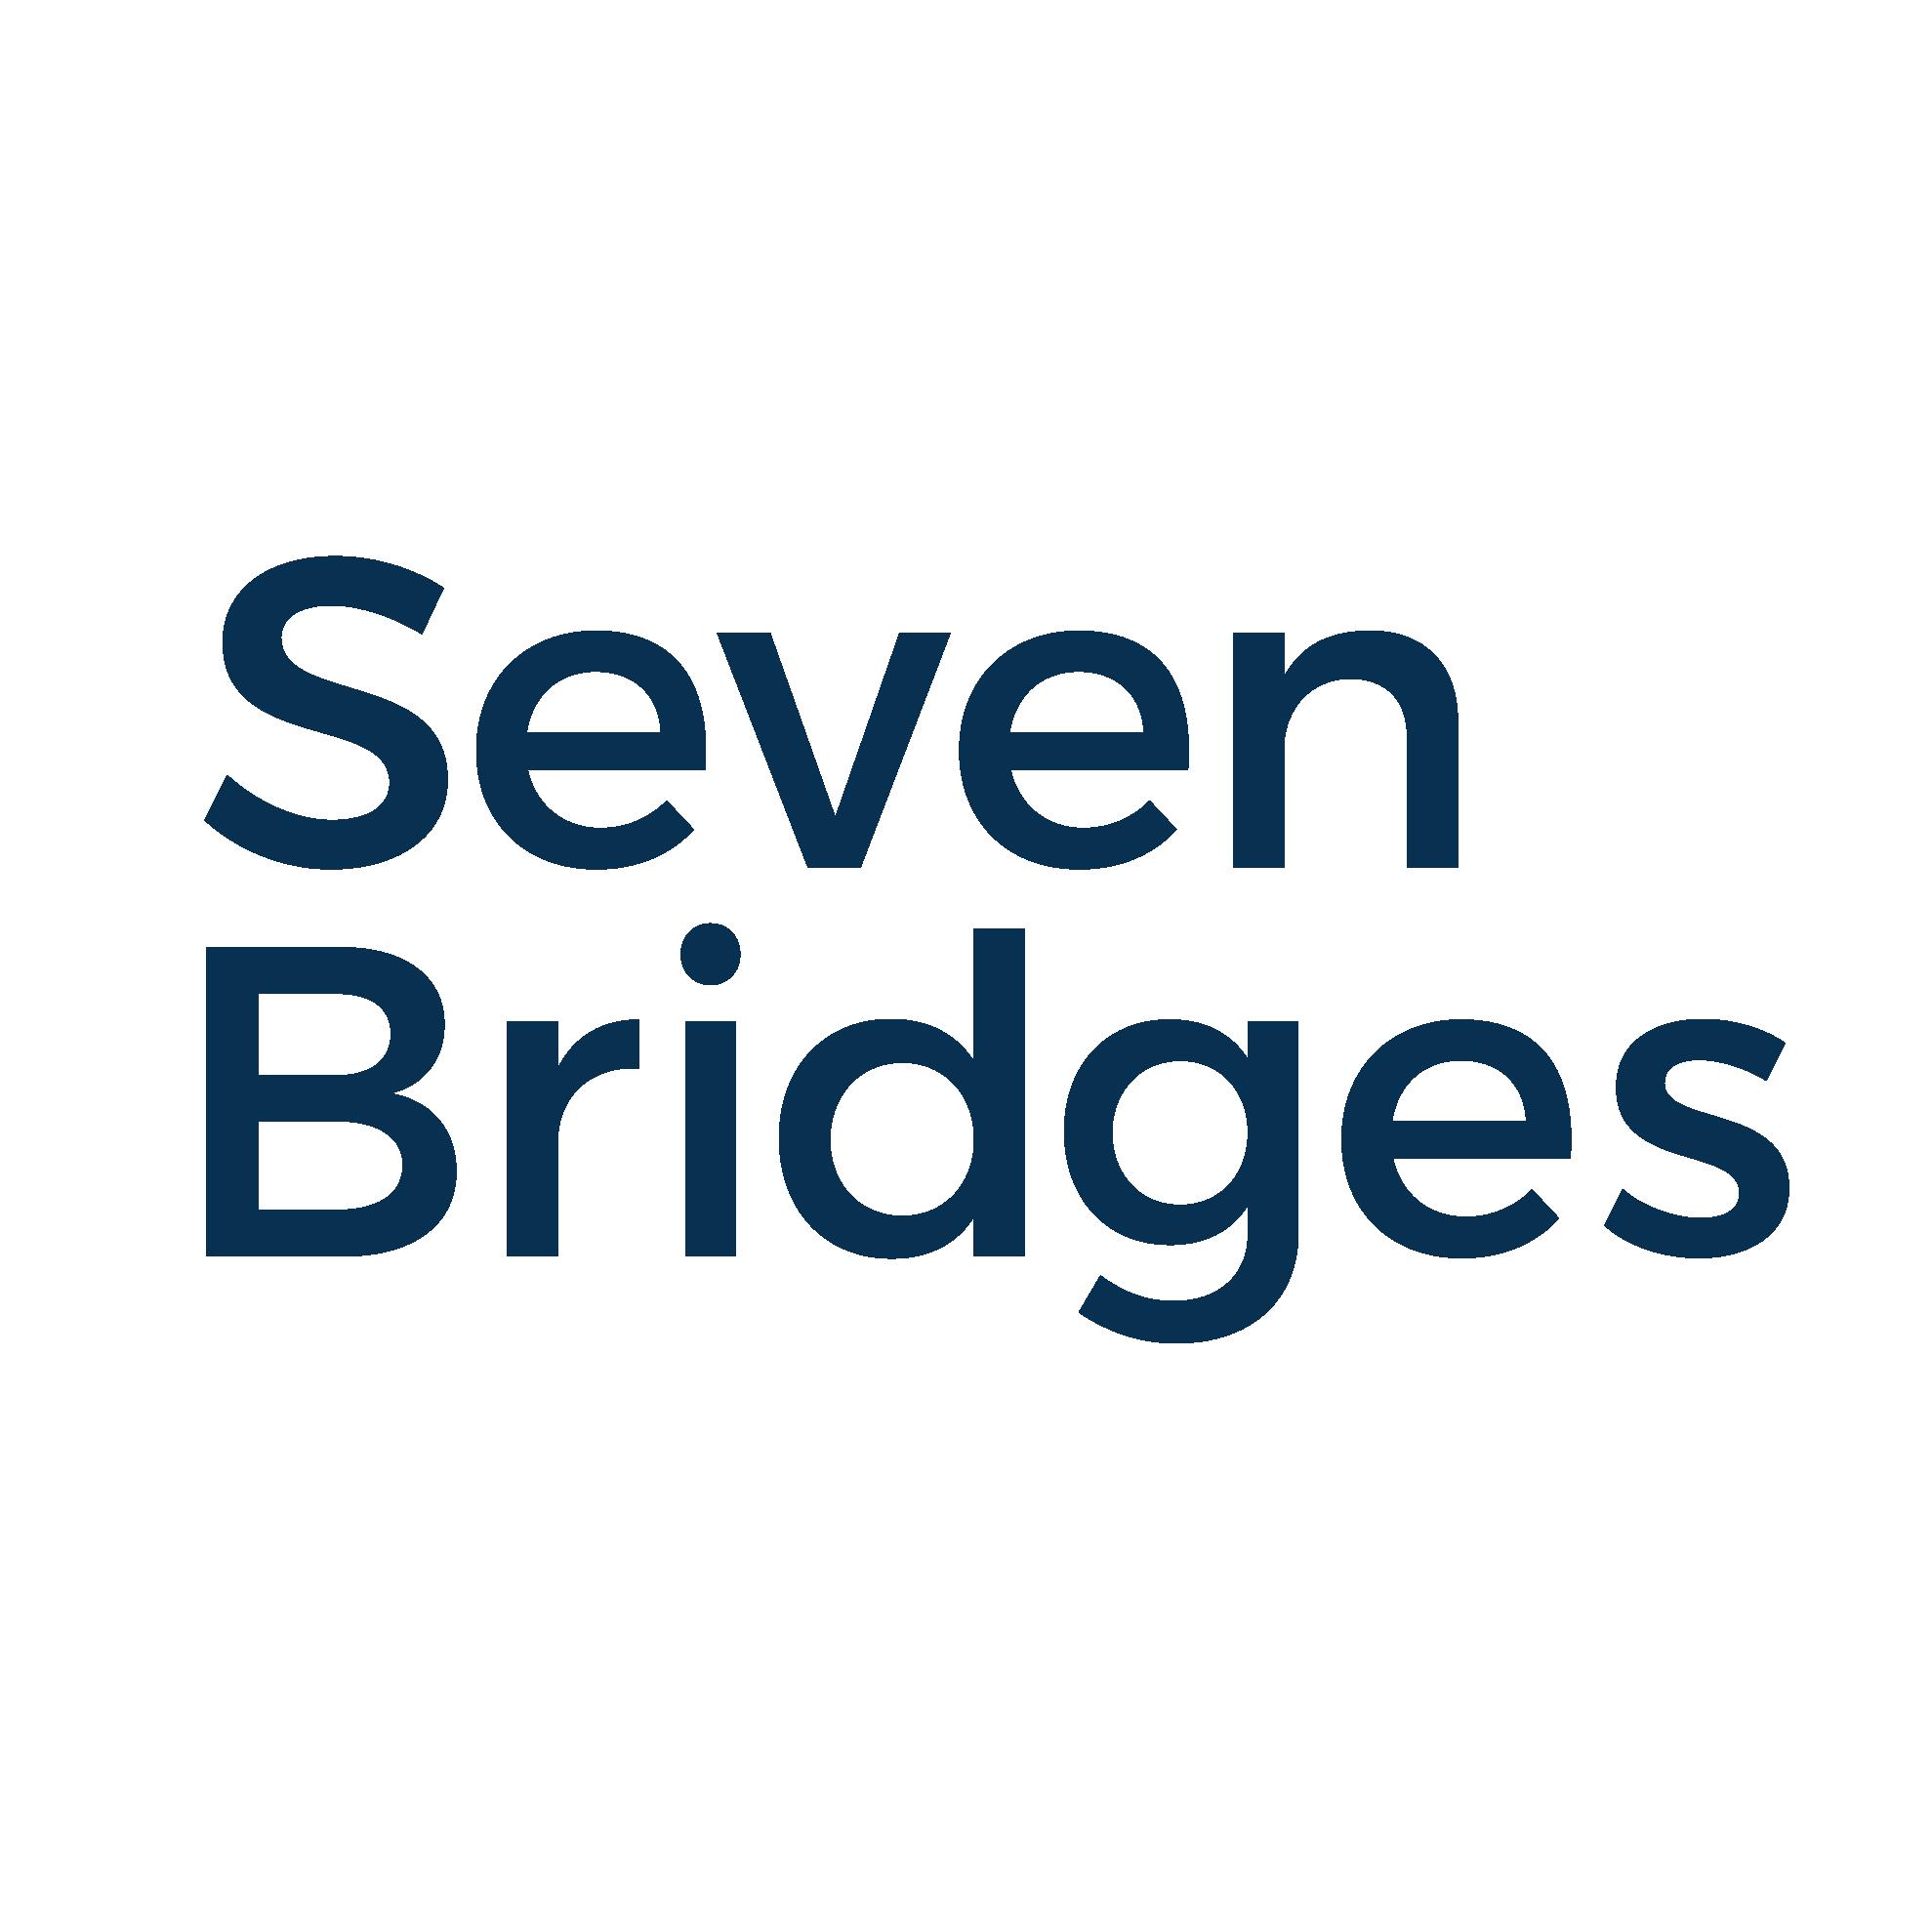 seven bridges logo